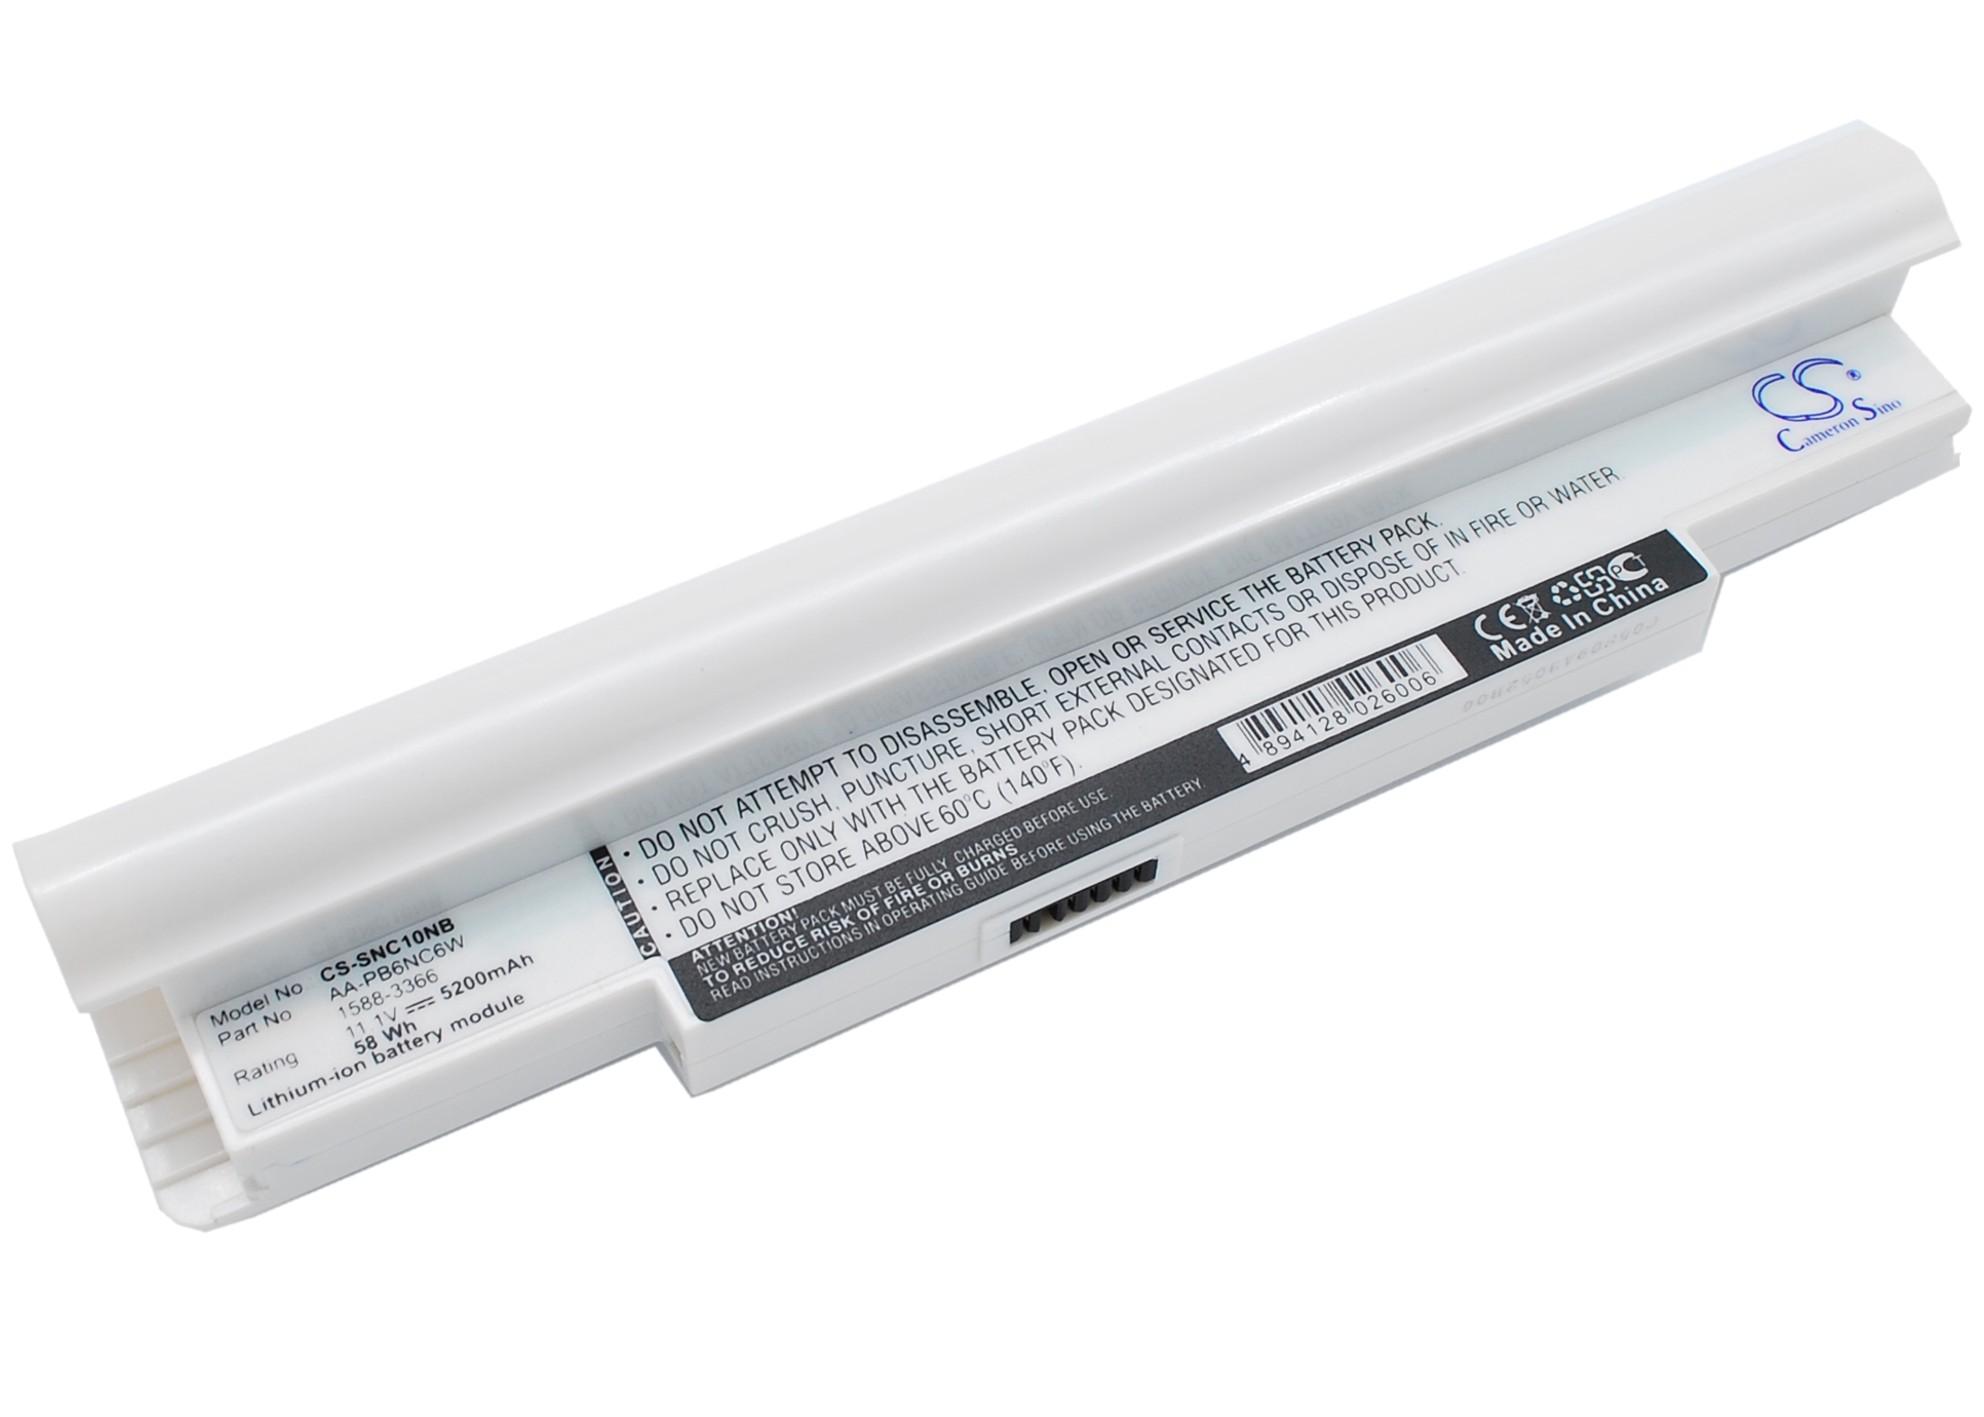 Cameron Sino baterie do notebooků pro SAMSUNG NP-N130-KA05US 11.1V Li-ion 5200mAh bílá - neoriginální